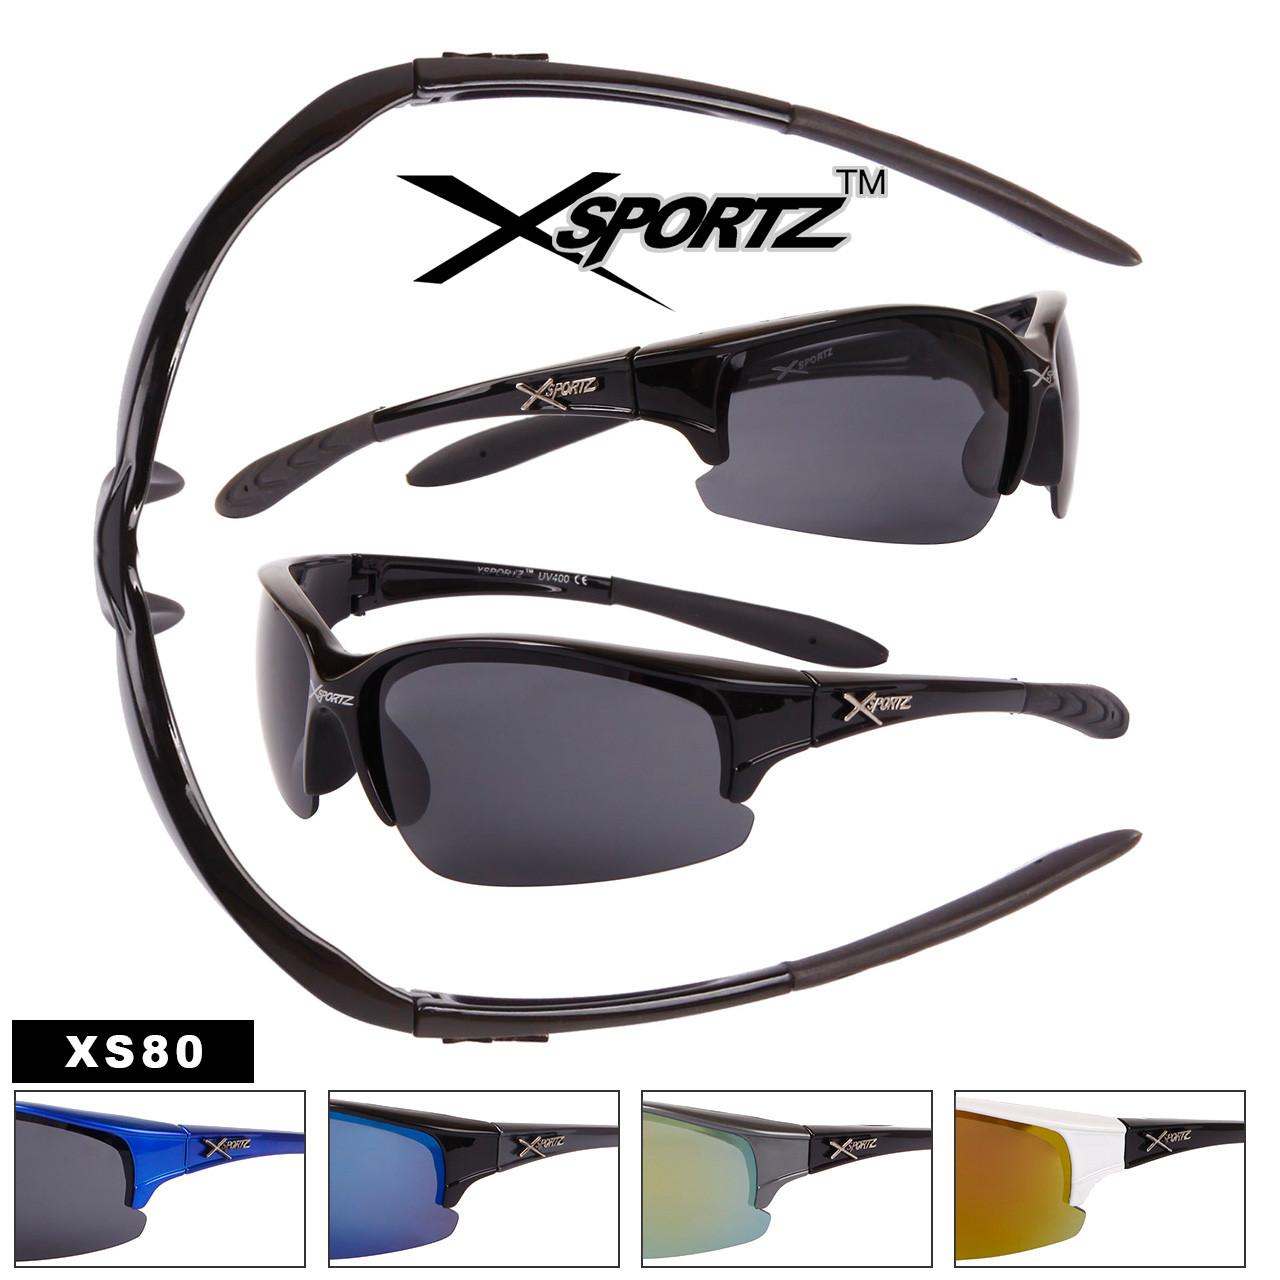 Xsportz Sports Sunglasses Wholesale - Style #XS80